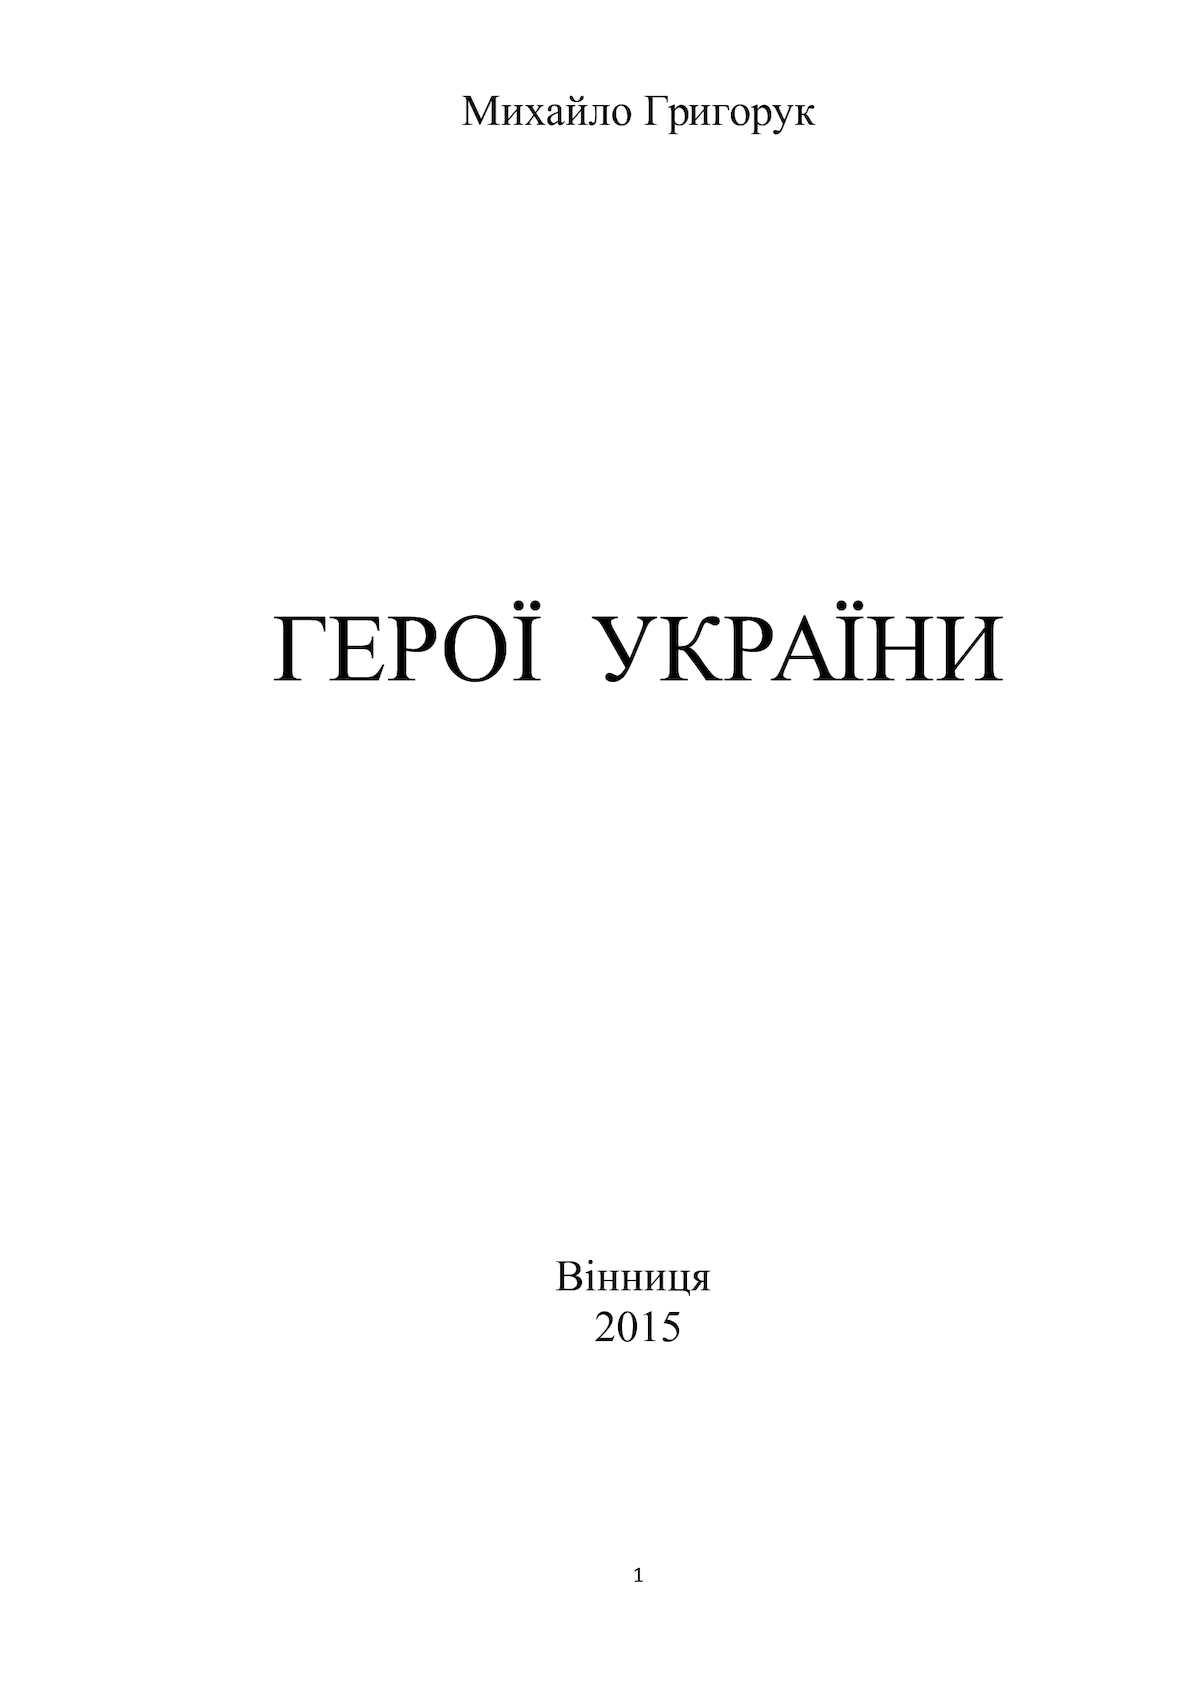 Calaméo - Герої. Михайло Григорук acc6579c246e9